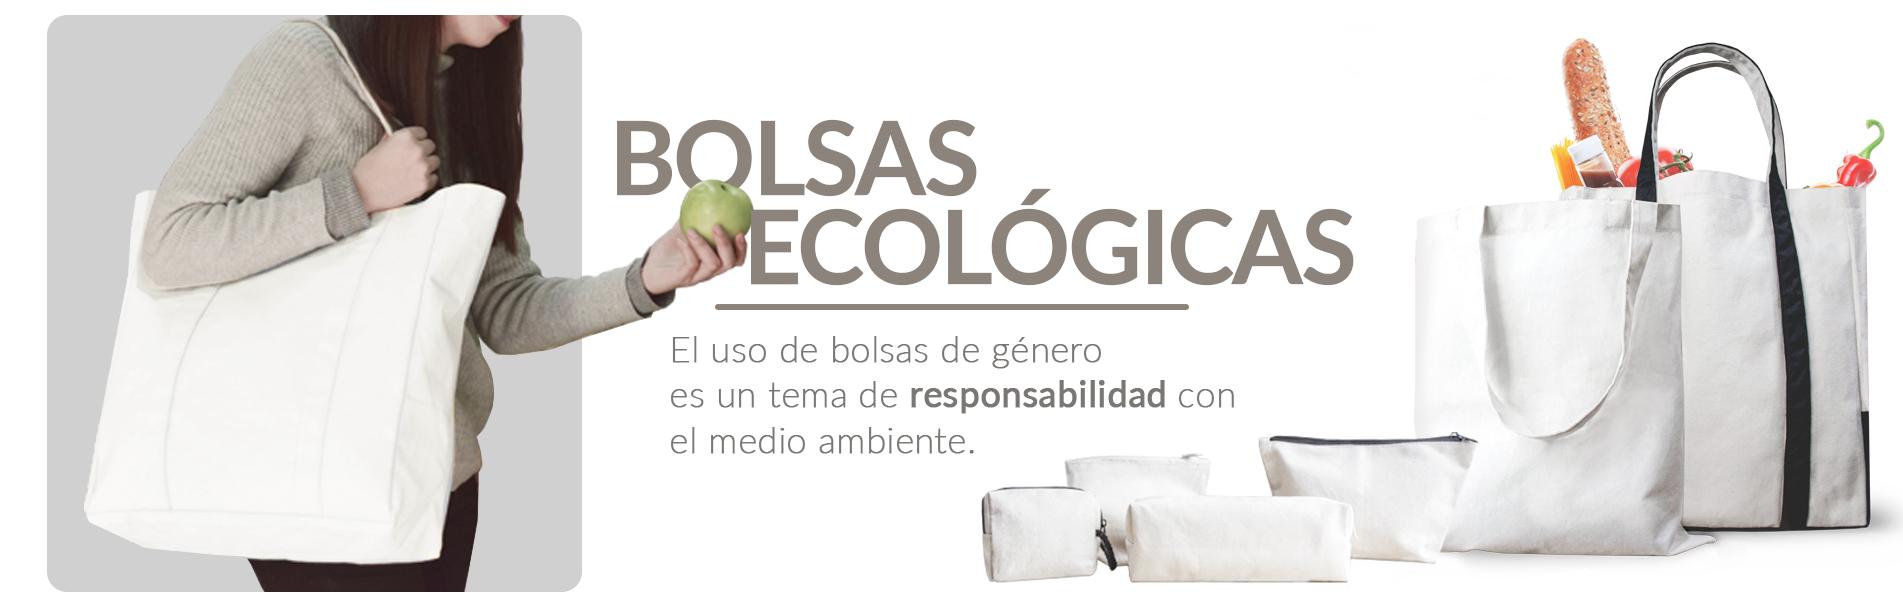 Banner--uso-de-bolsas-ecologicas3